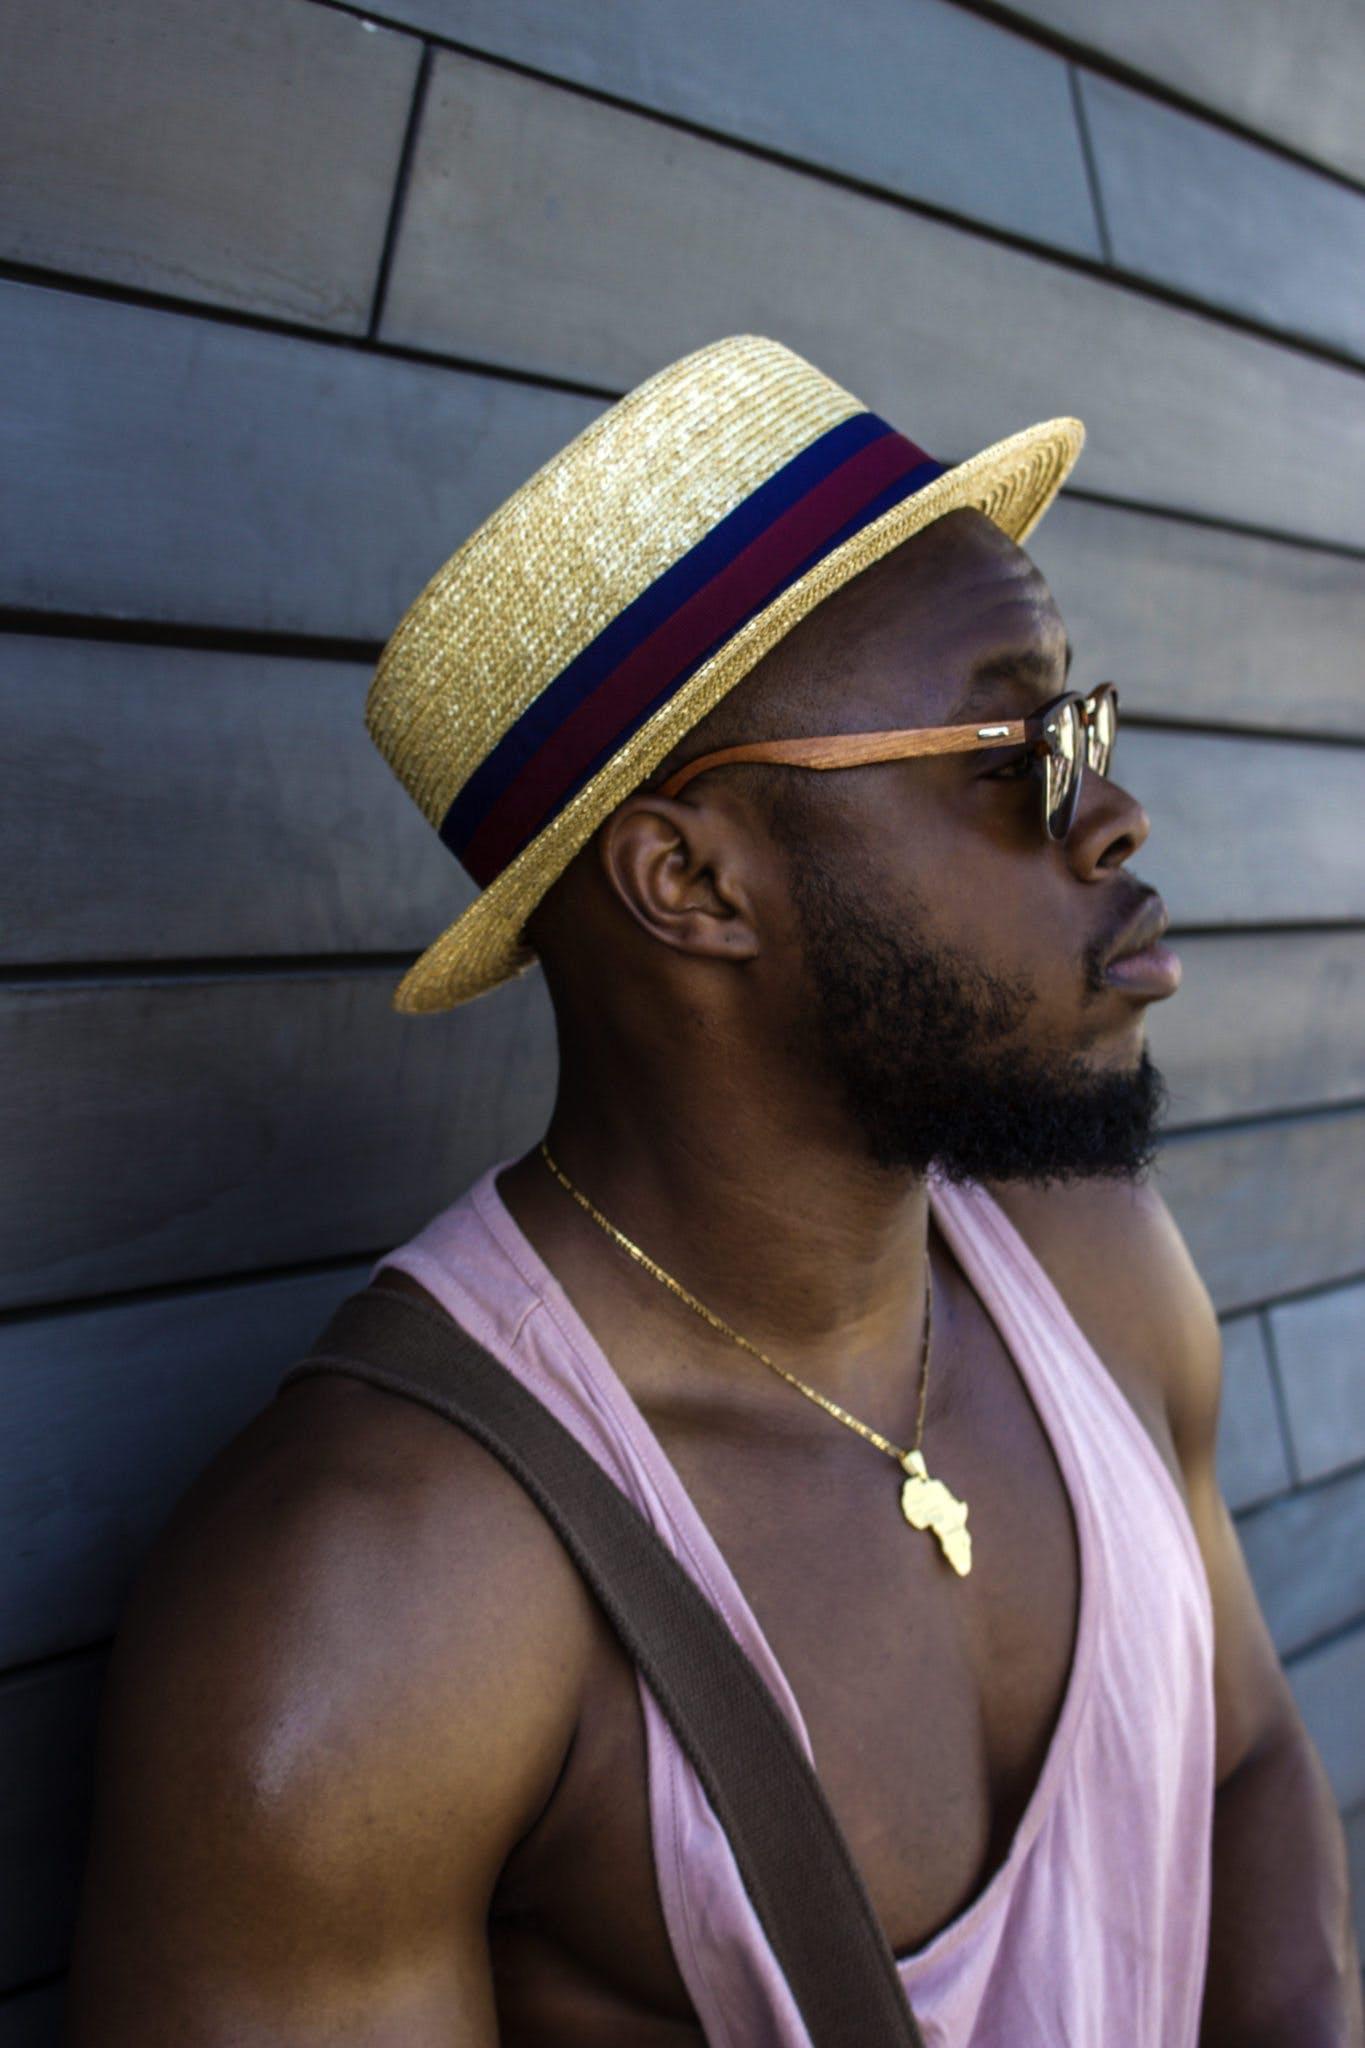 Man Wearing Hat and Pink Tank Top